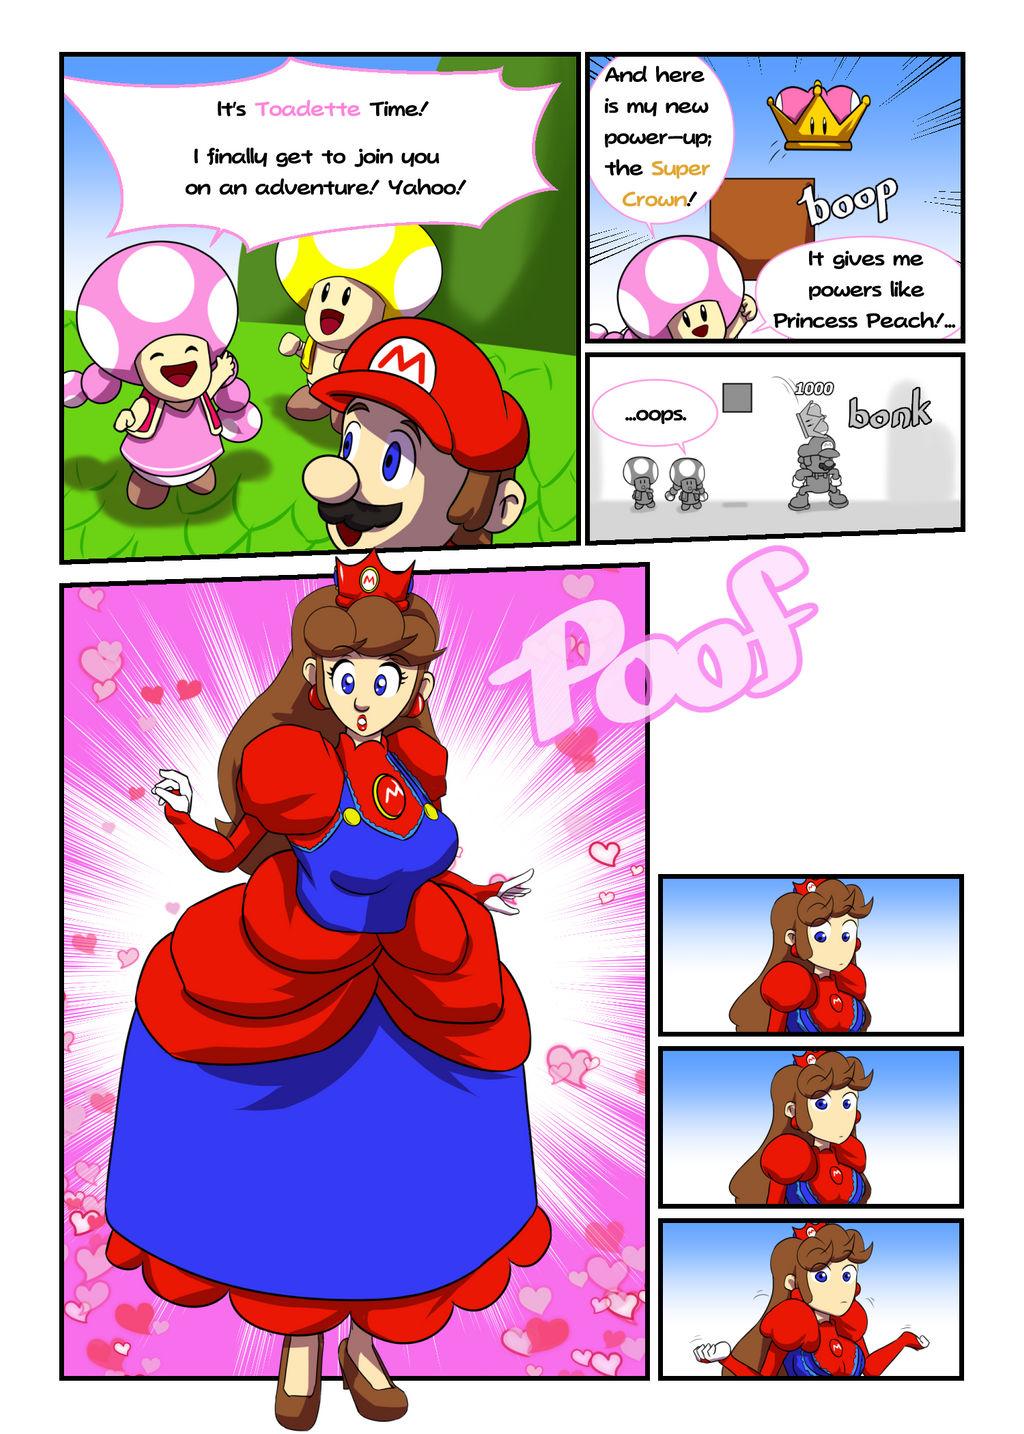 Princess Mario Super Crown By Fieryjinx On Deviantart